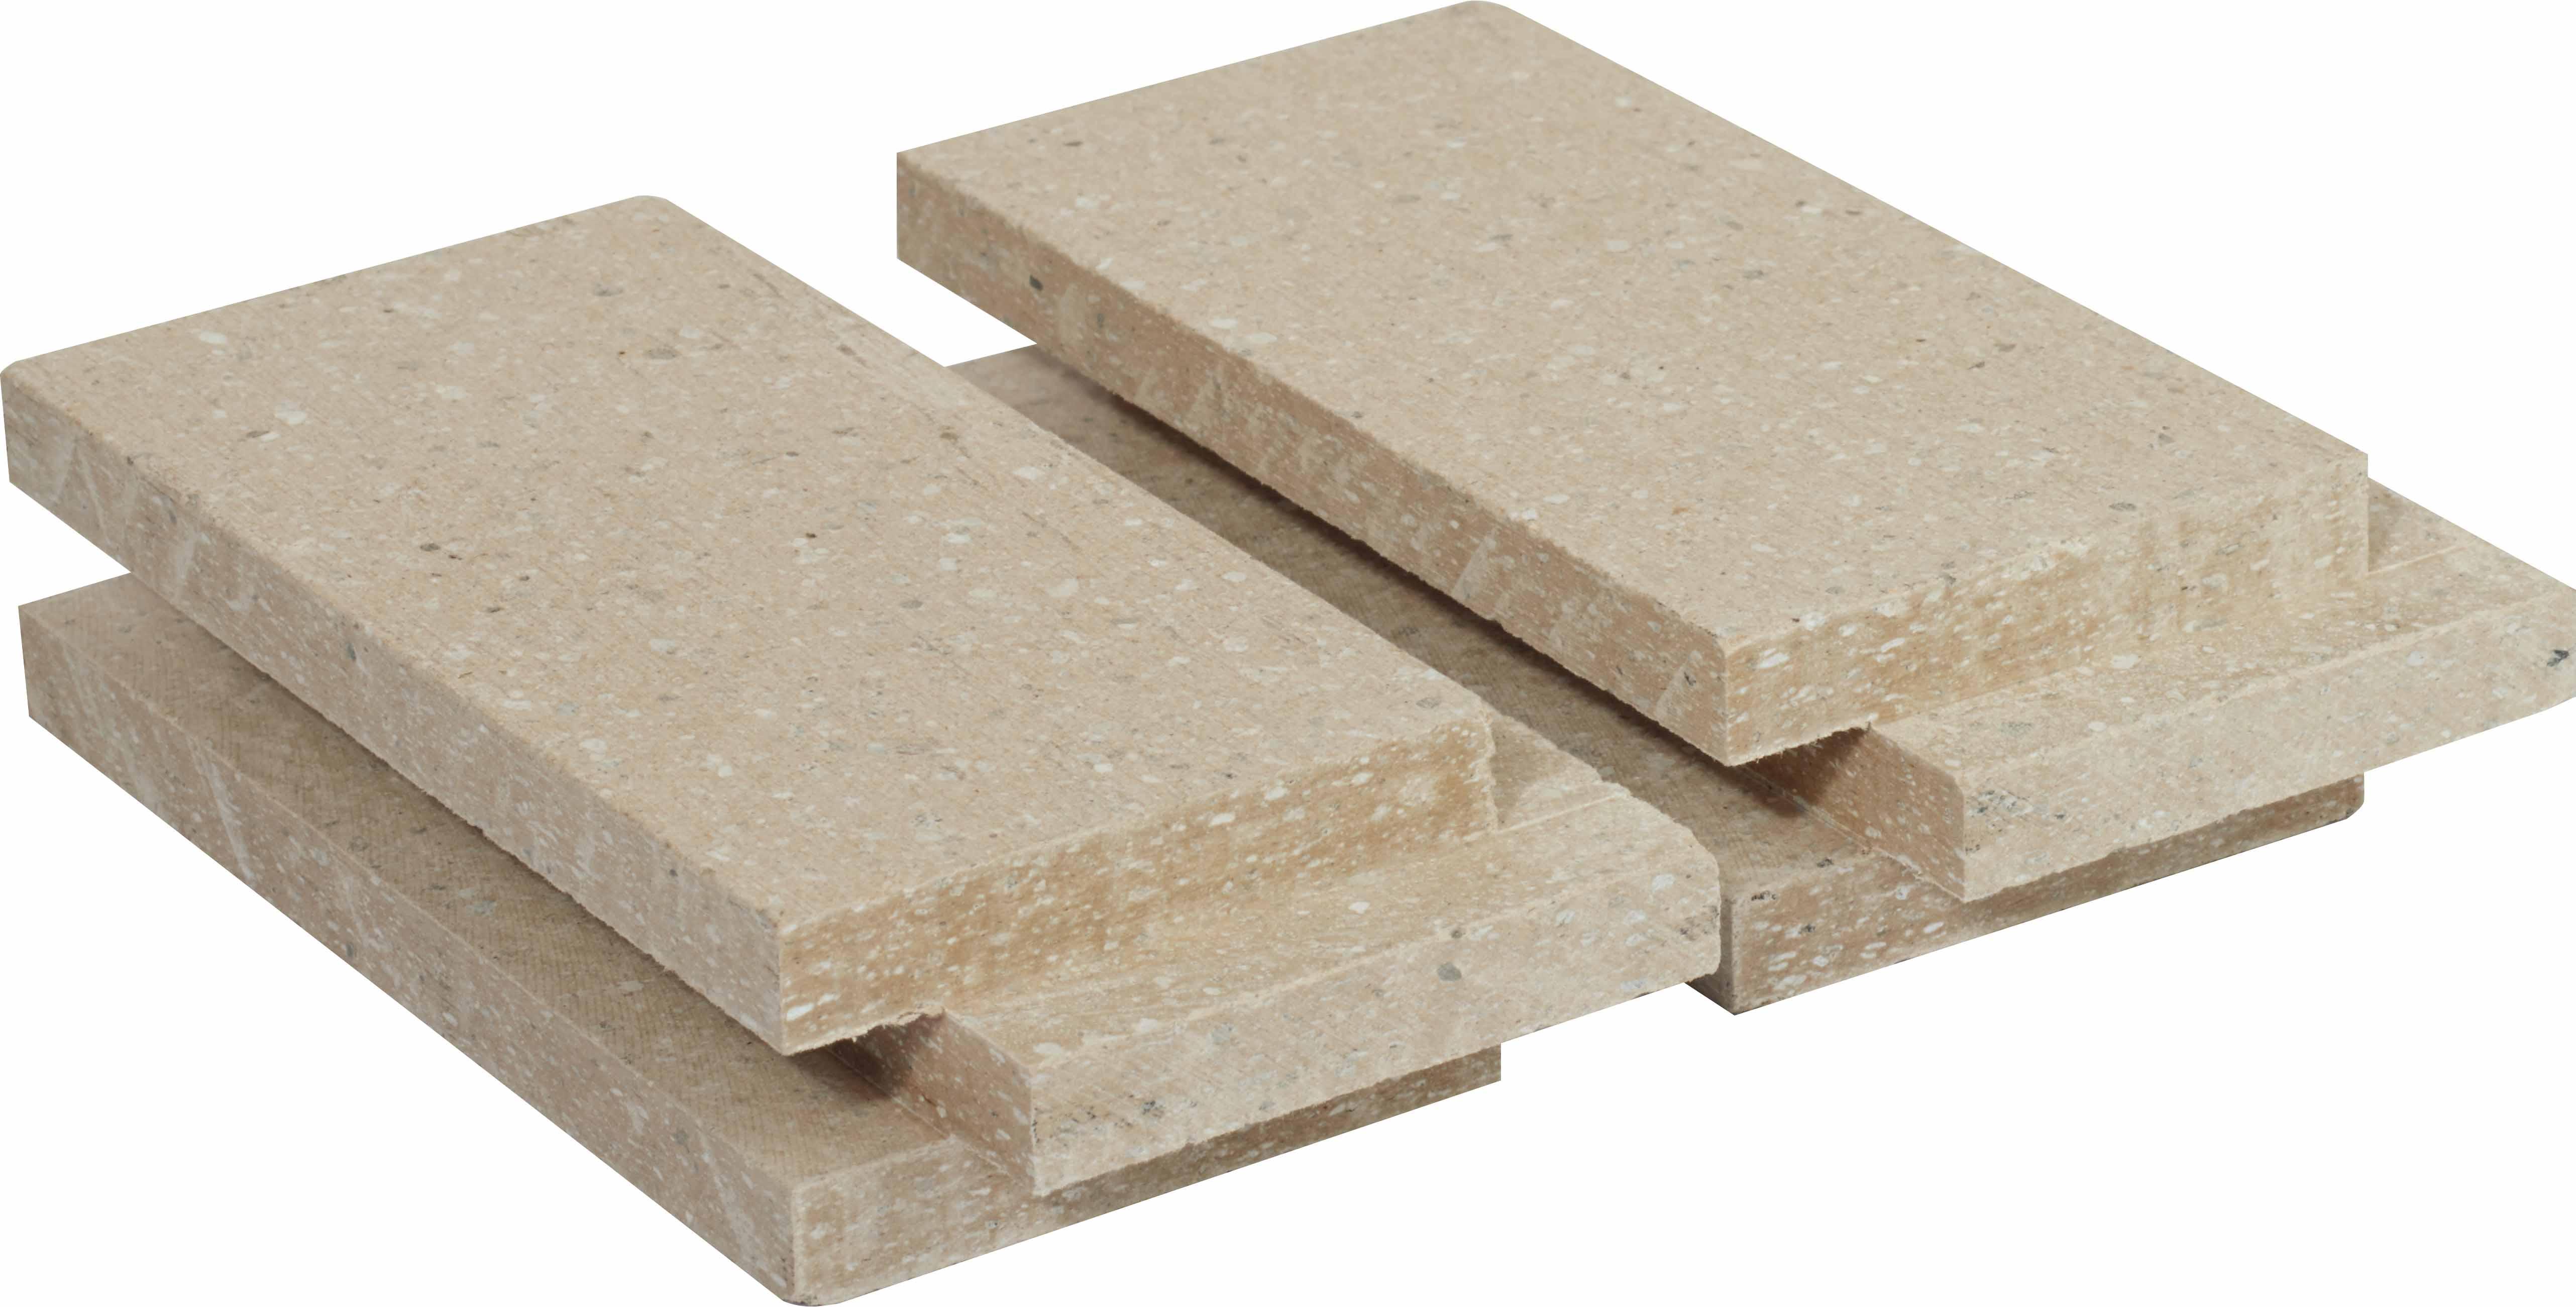 Tetris floor